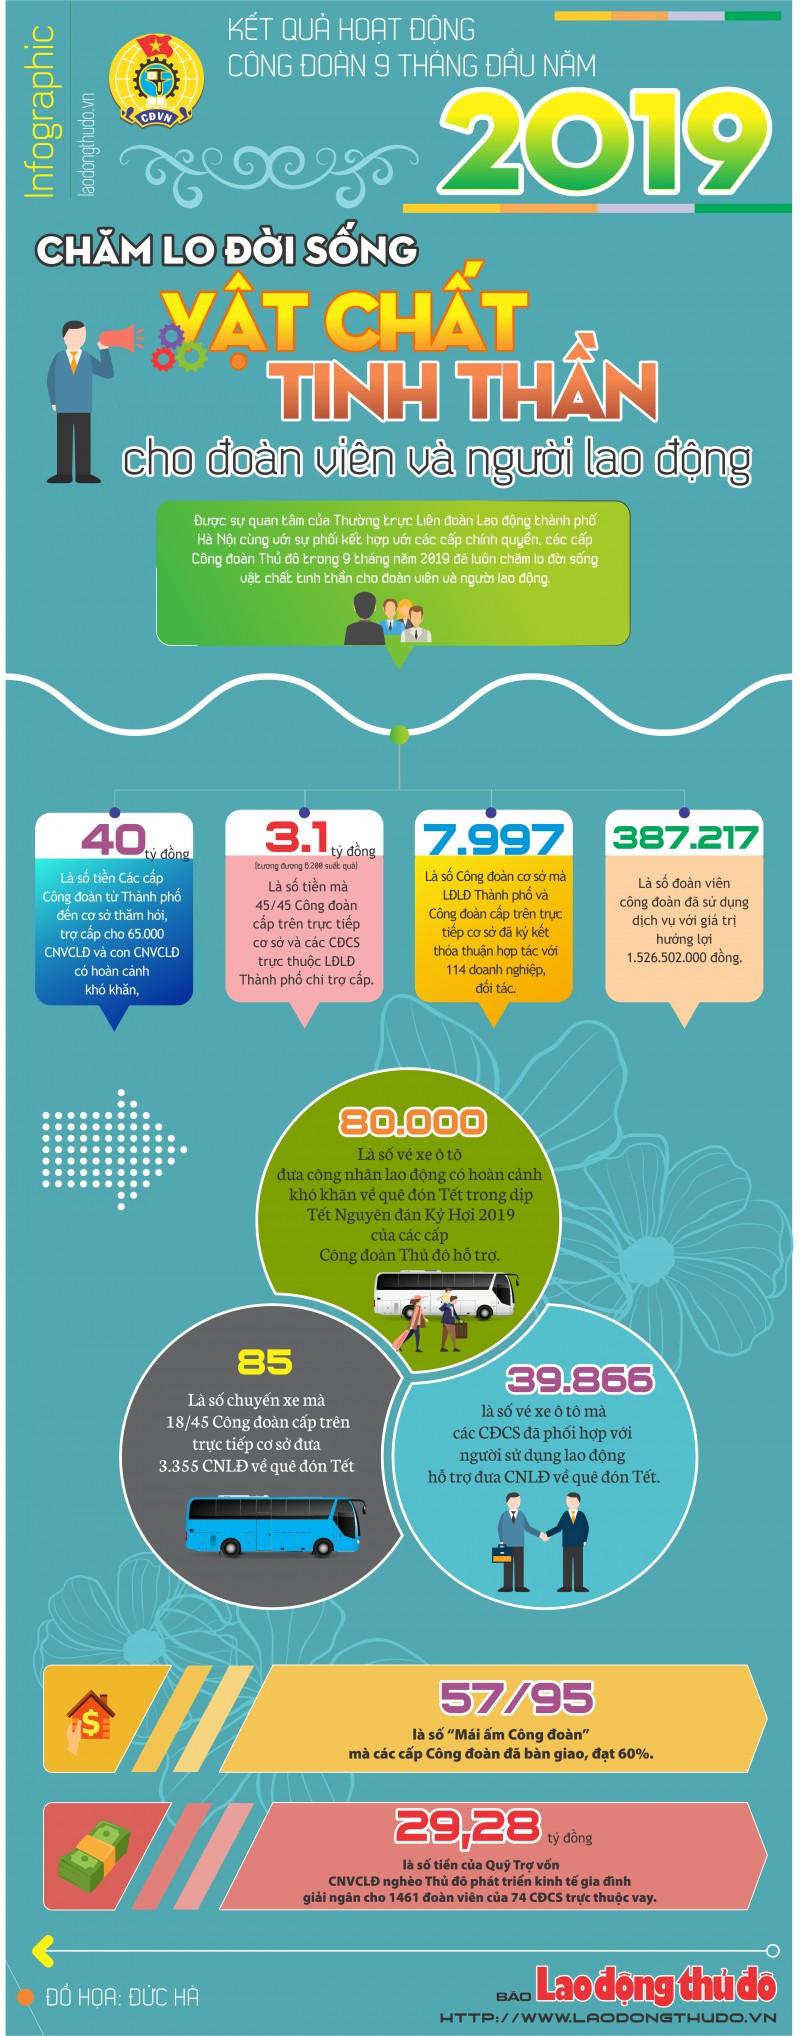 infographic cham lo doi song vat chat tinh than cho doan vien va nguoi lao dong